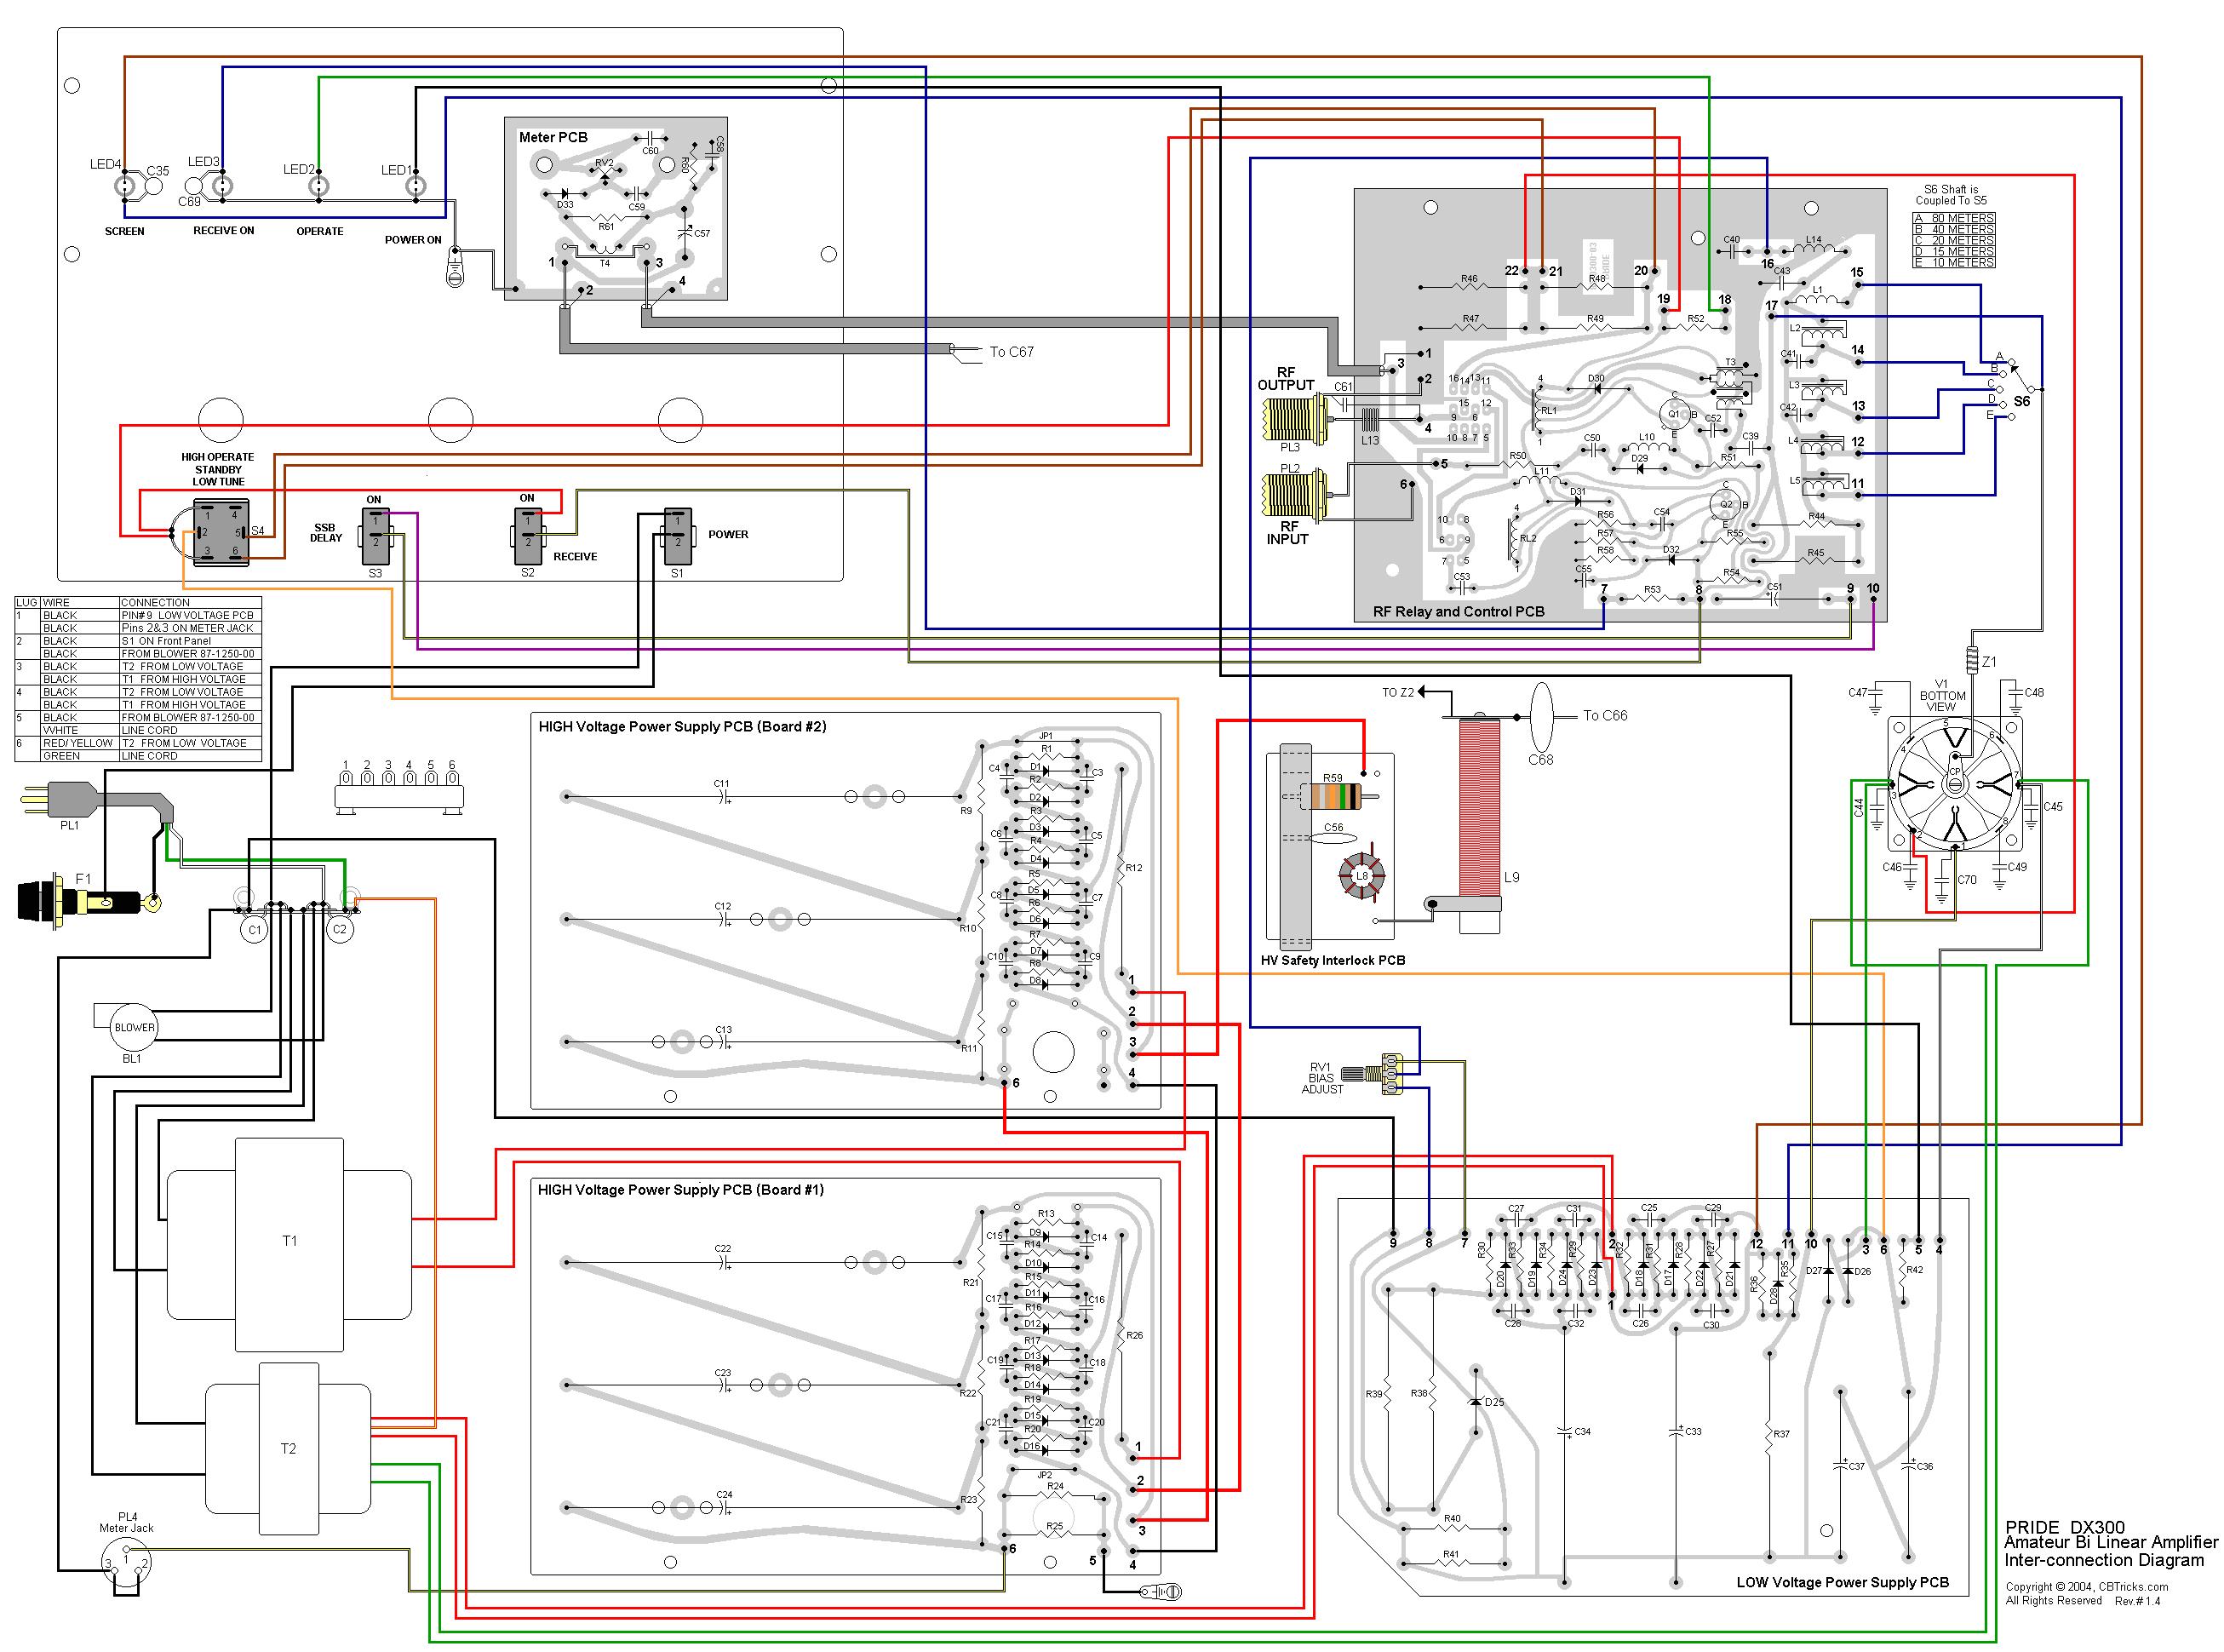 pride wiring harness diagram wiring diagram expert pride wiring harness diagram